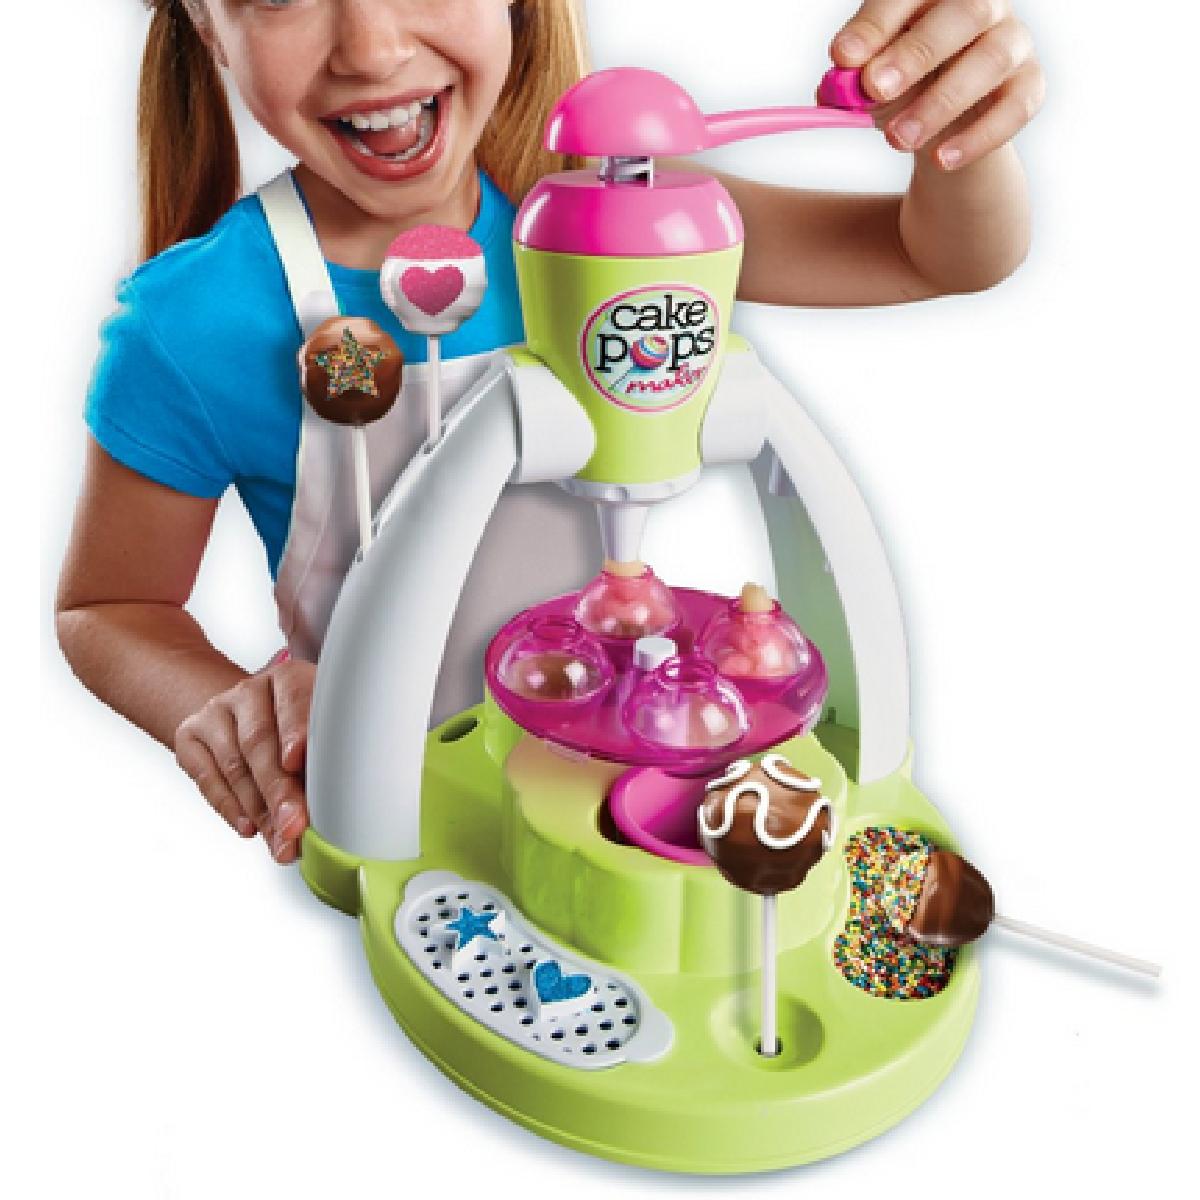 La Fabrique De Cake Pops Spin Master